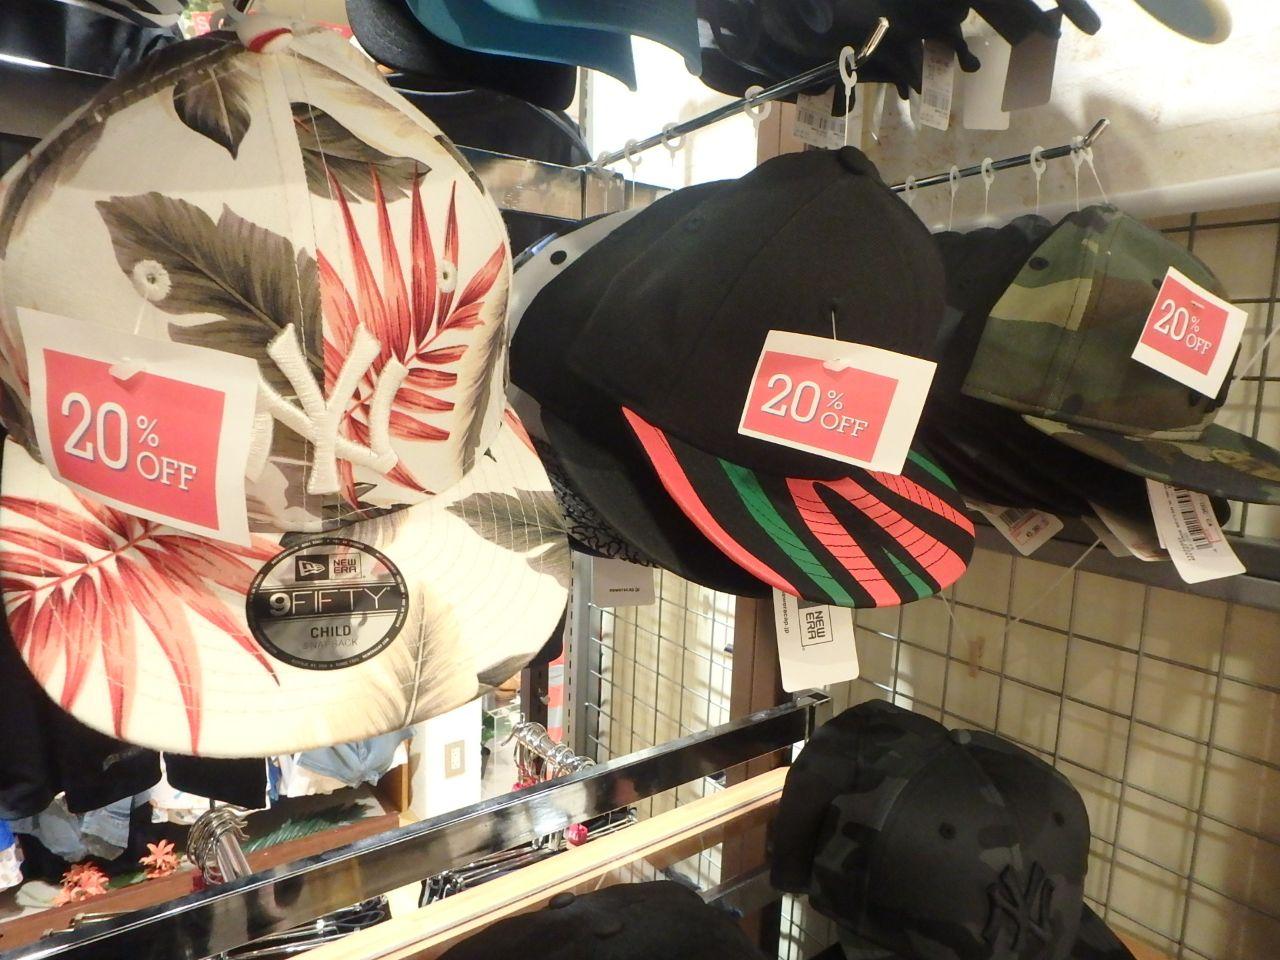 Hats Clothing, Shoes & Accessories New Era Cap Kids Sale Price